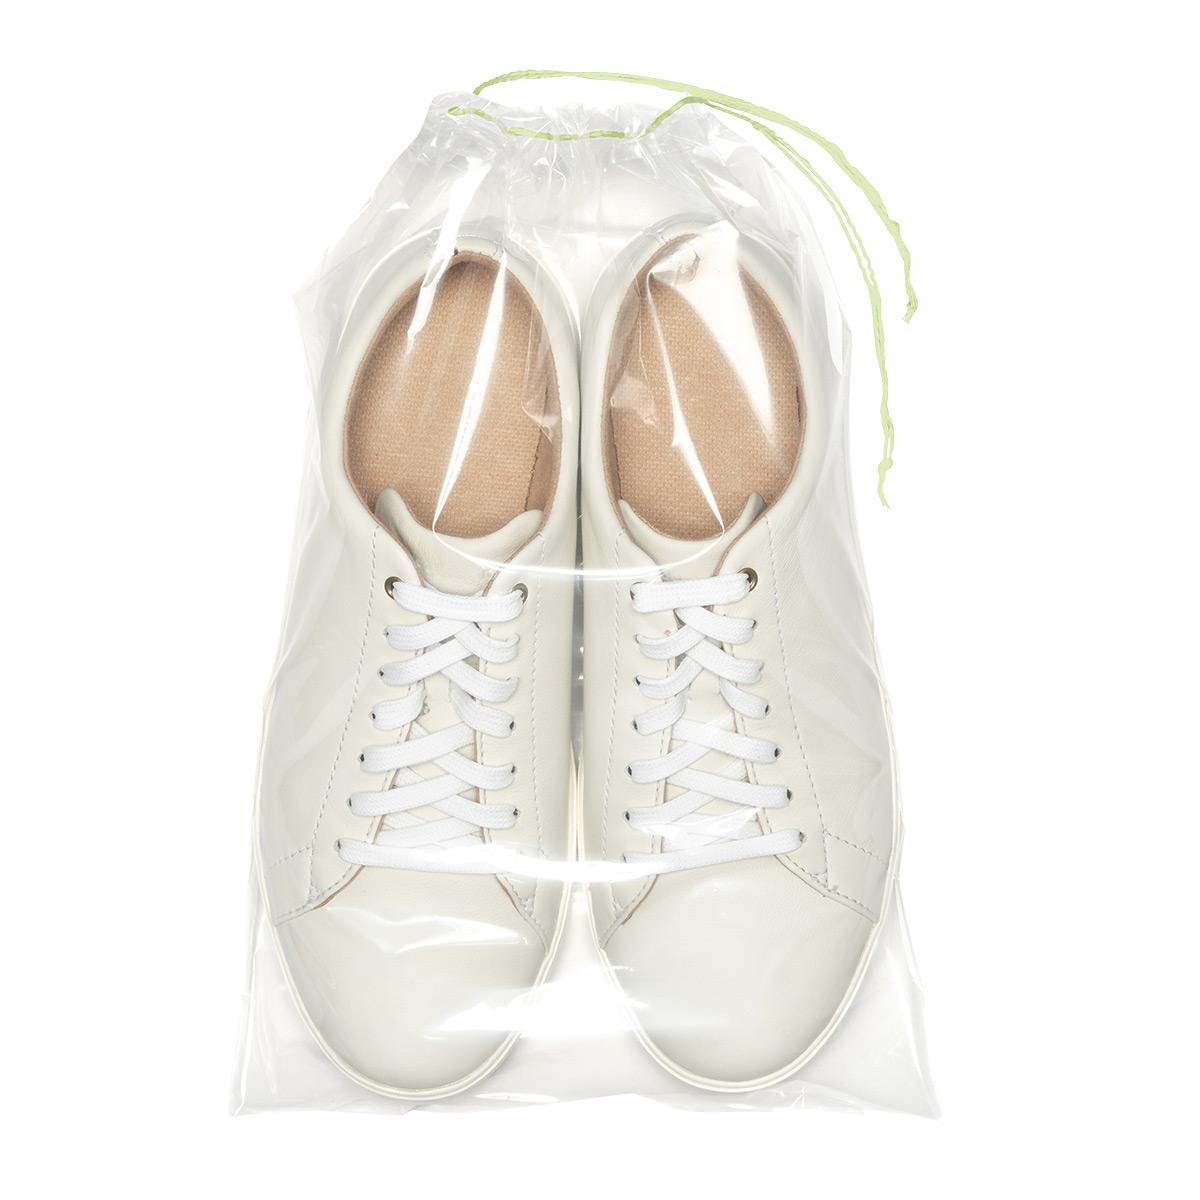 CleanTrvlr Shoe Bags